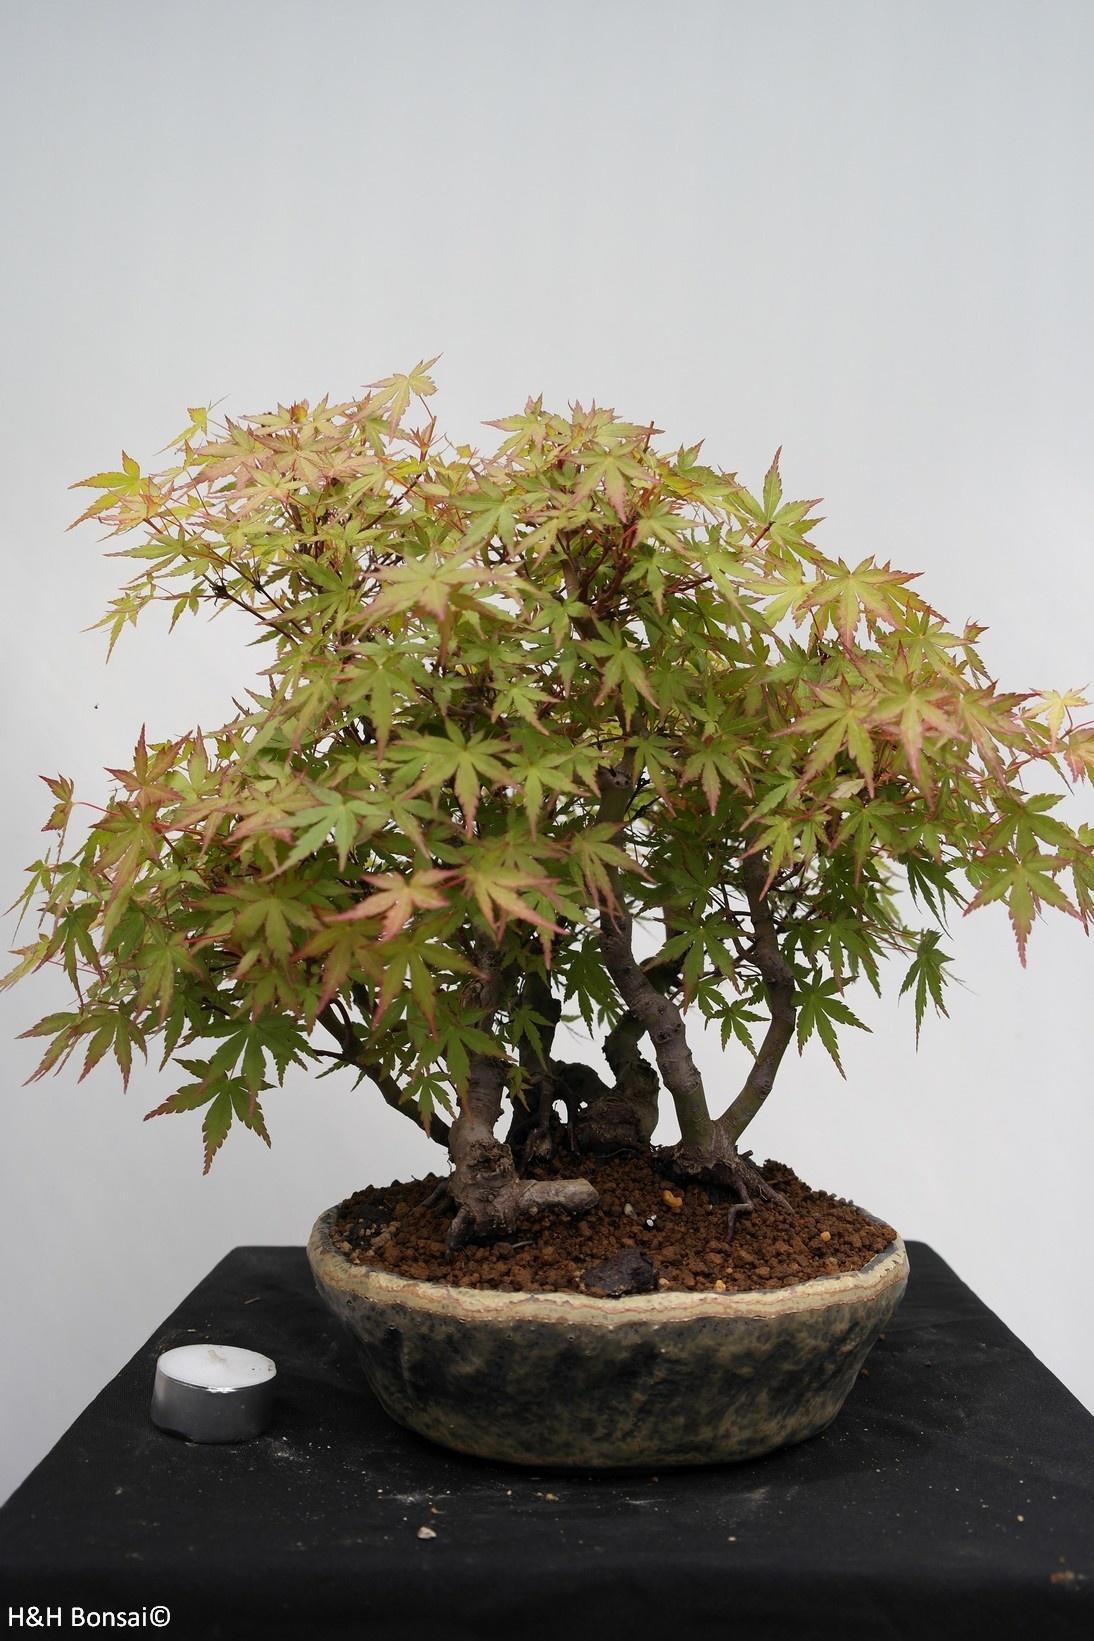 Bonsai Acer palmatum, Japanse esdoorn, nr. 7447